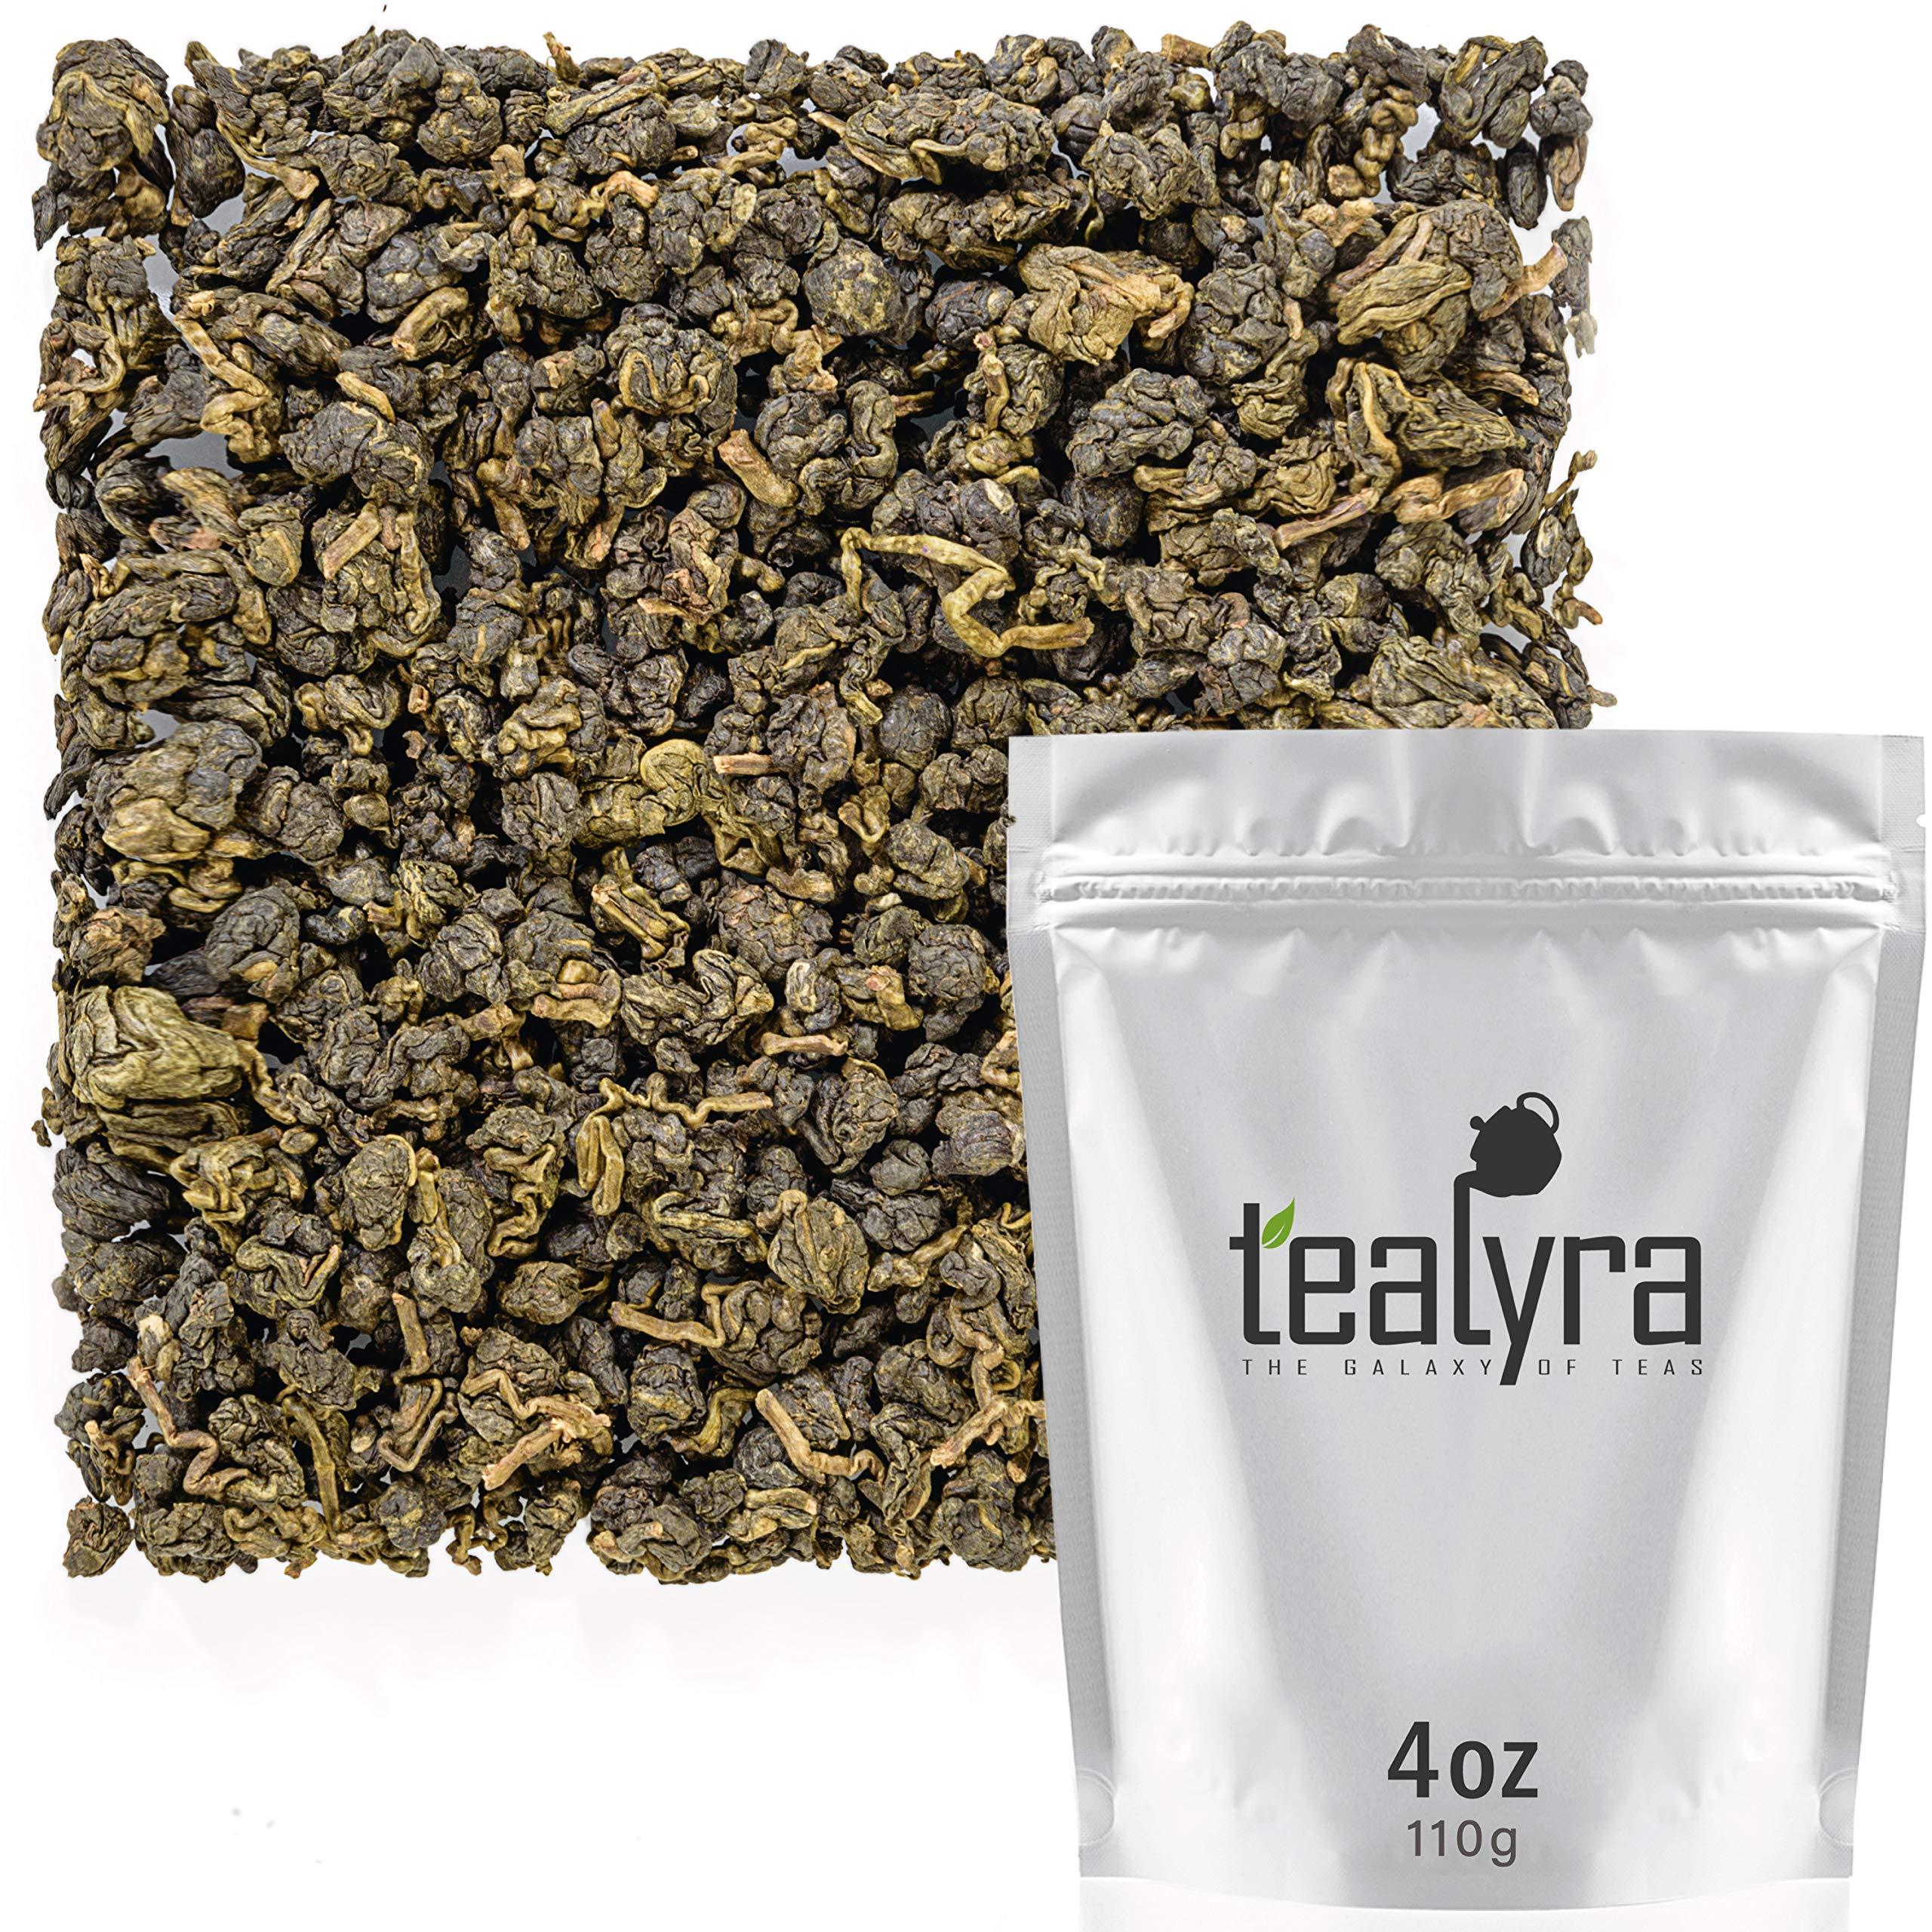 Tealyra - Ginseng Oolong Premium - Best Taiwanese Oolong - Loose Leaf Tea - Healthy - Digest and Energy Tea -Medium Caffeine - 110g (4-ounce)